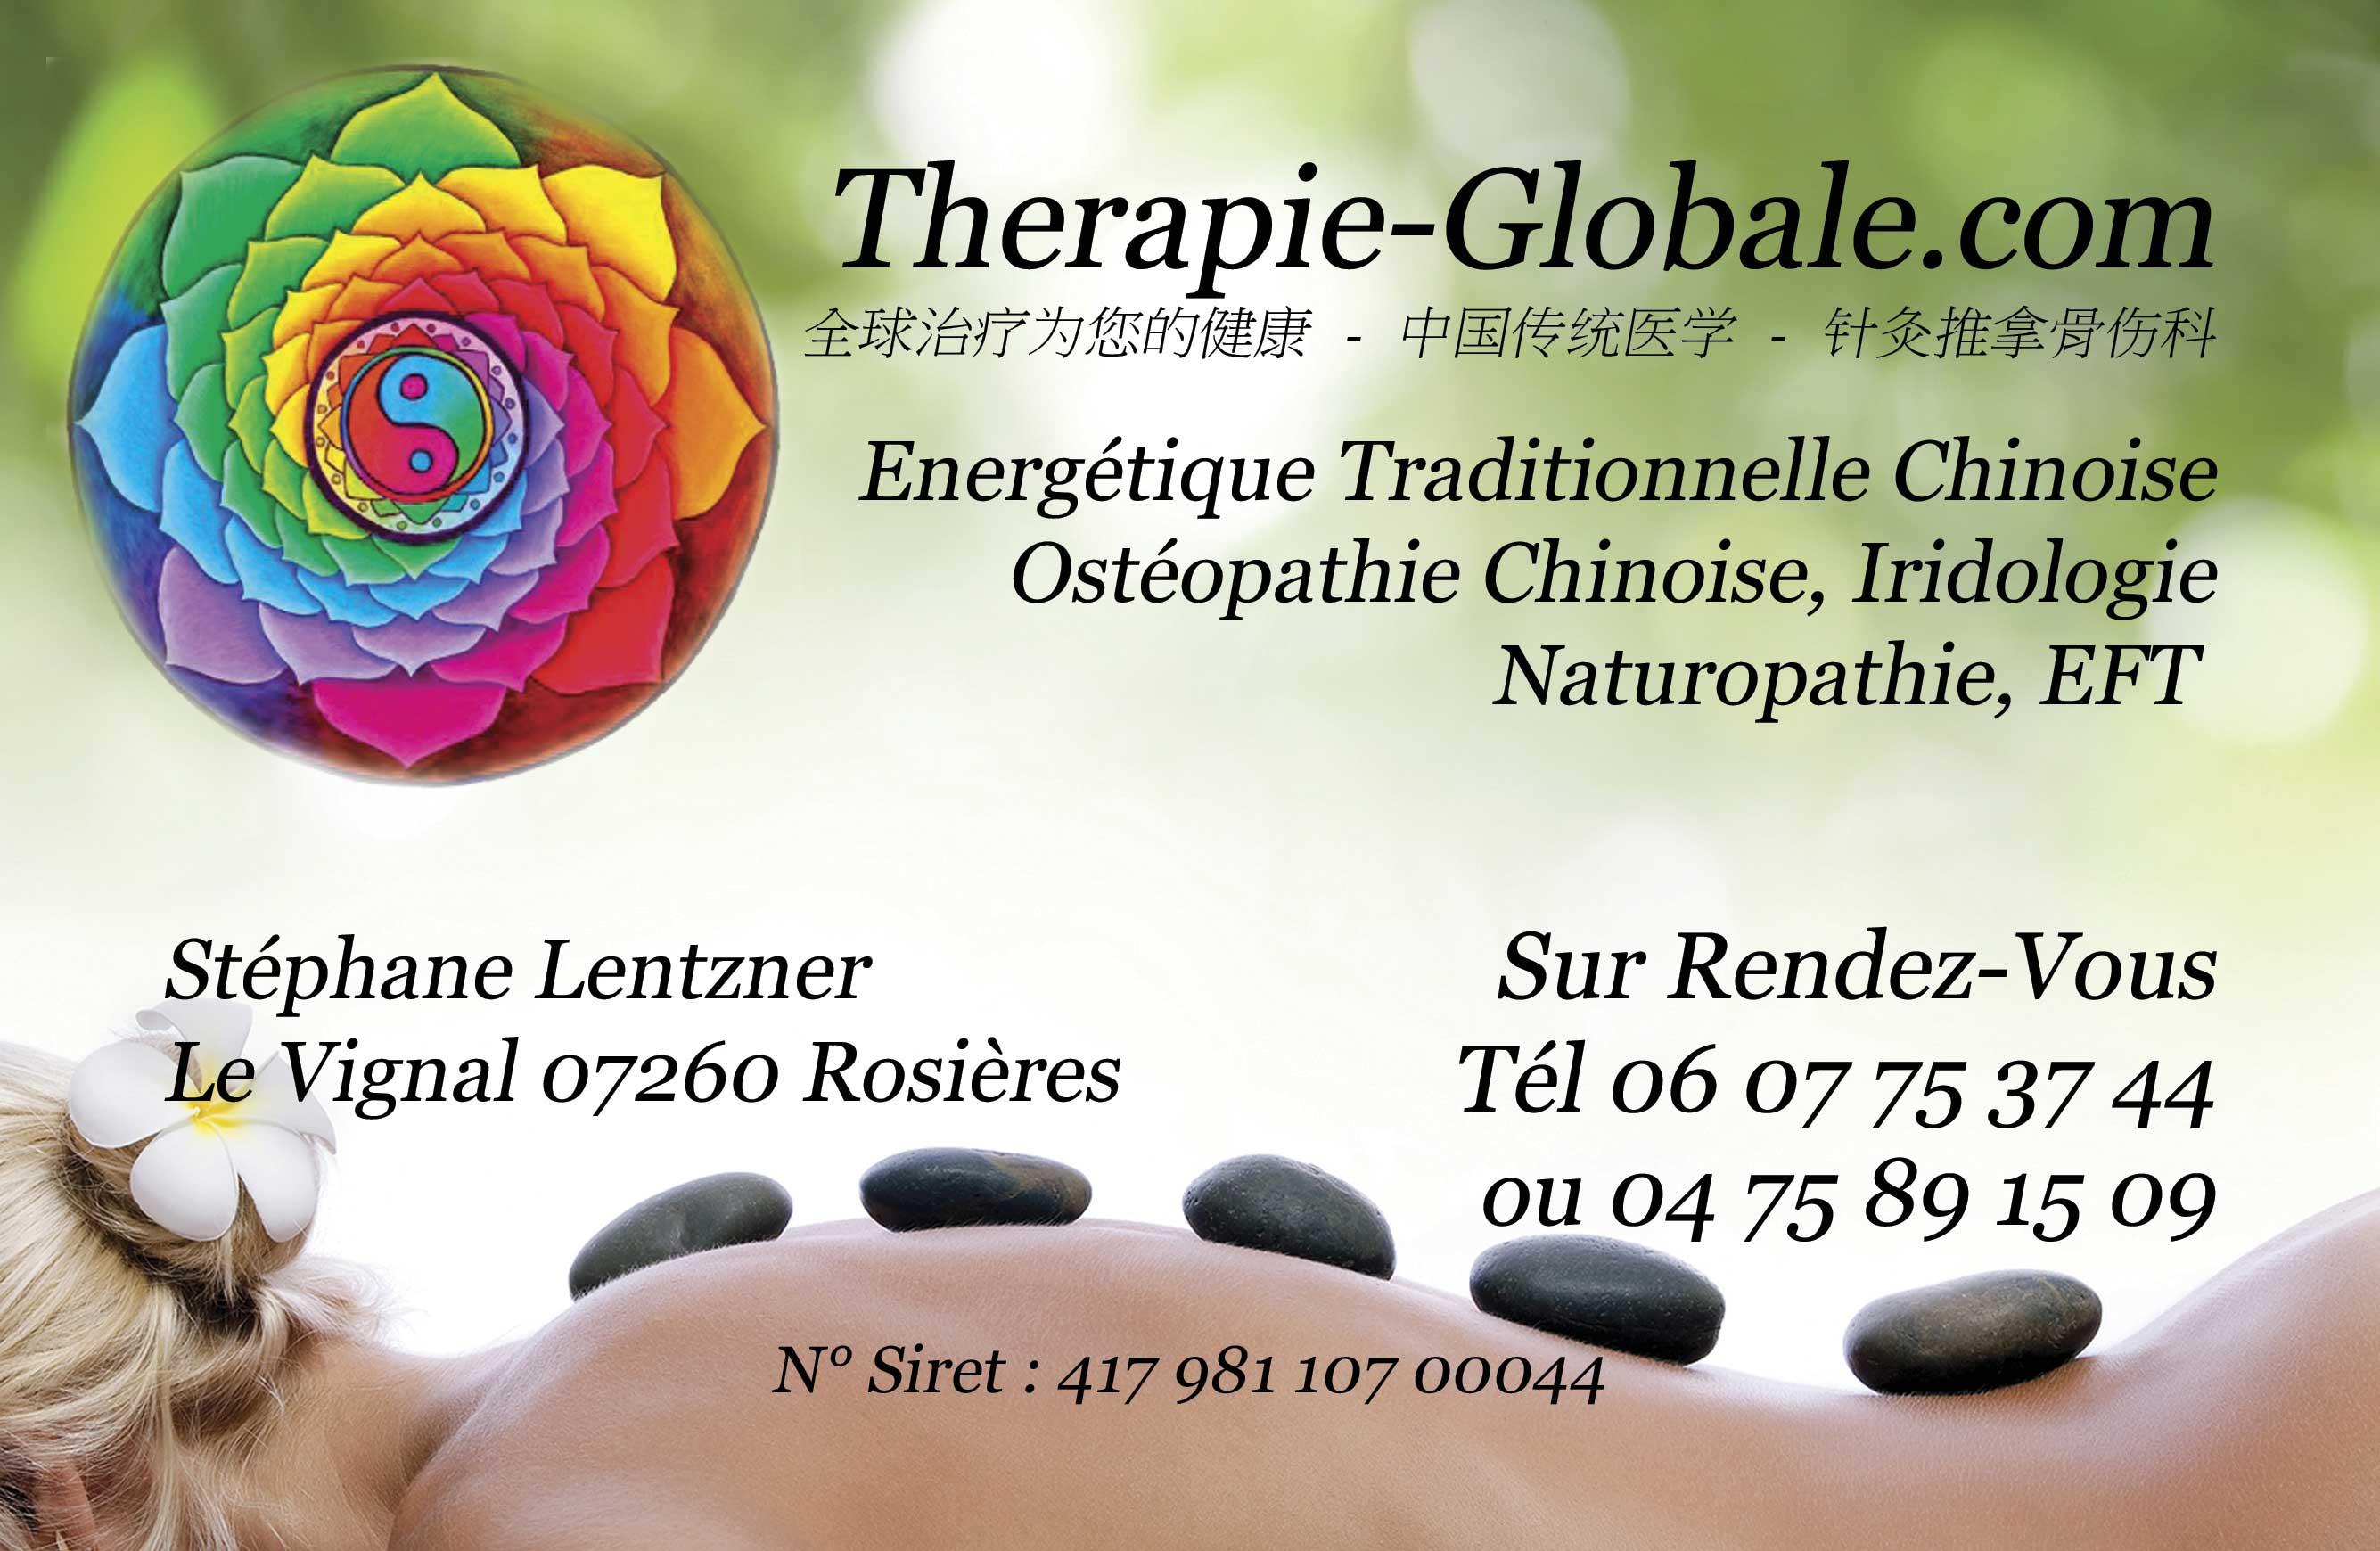 Praticien Naturopathe Therapeute En Naturopathie EFT Osteopathie Chinoise Et Medecine